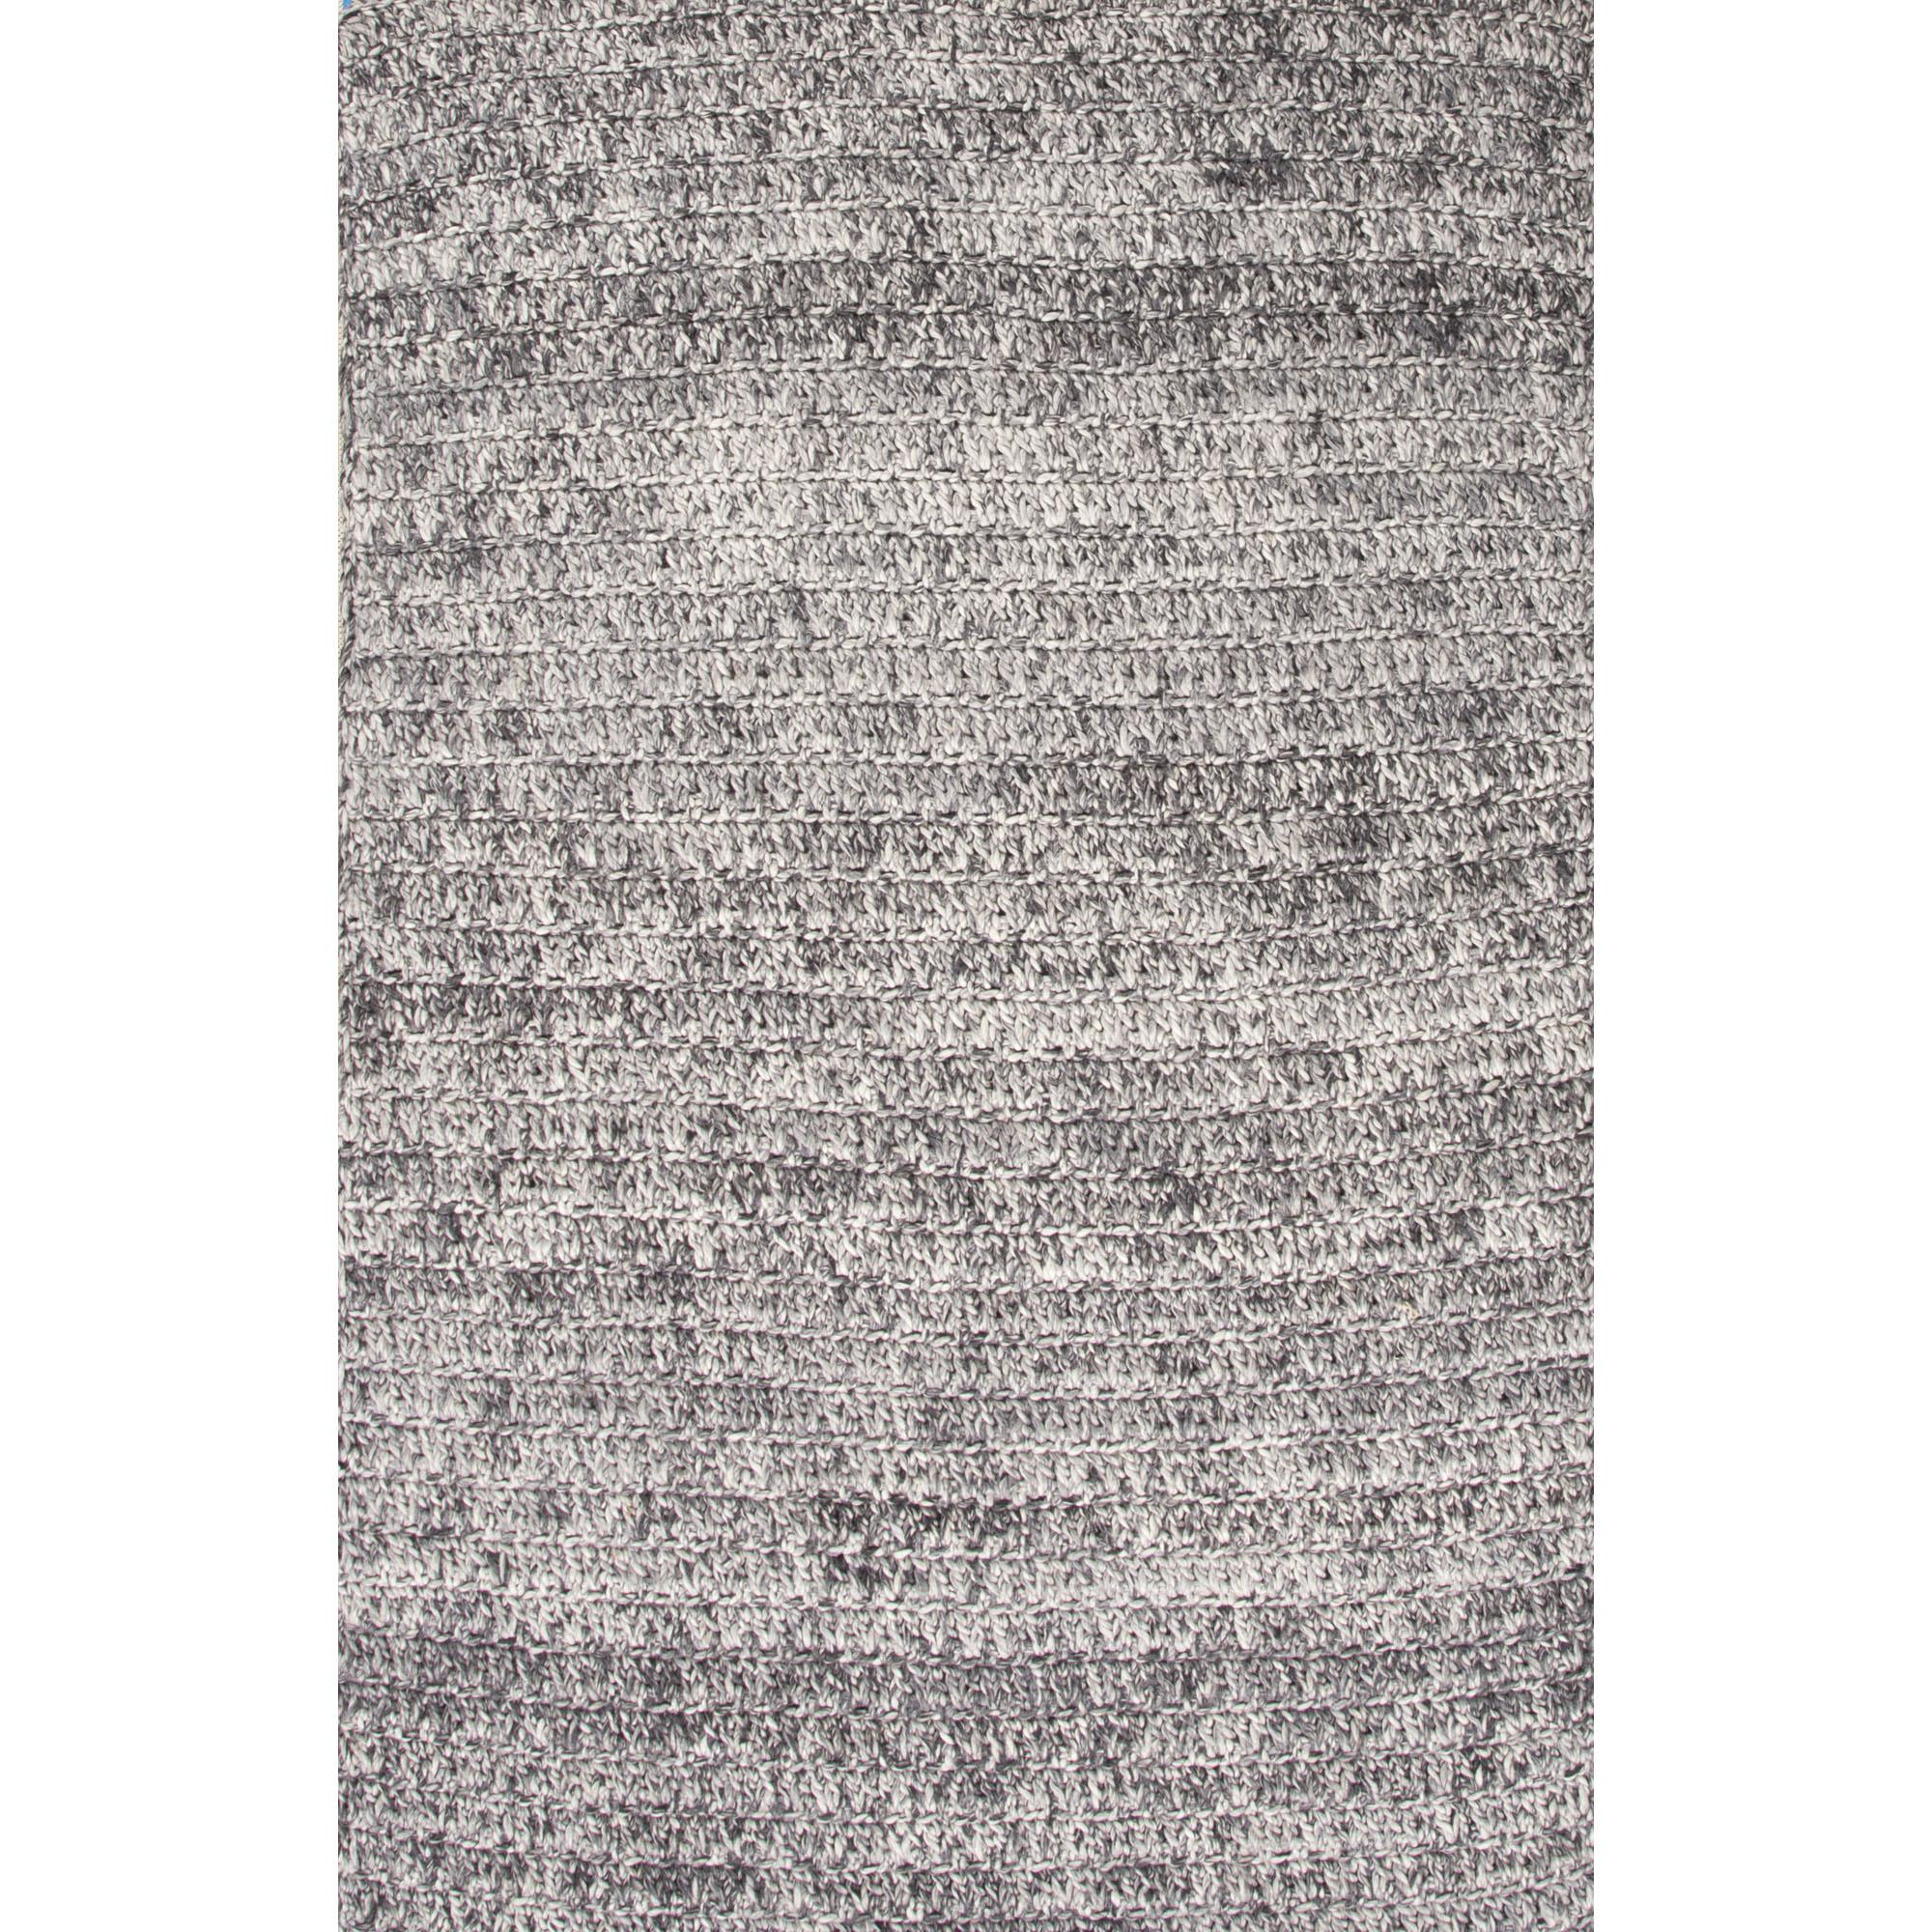 JAIPUR Rugs Scandinavia Dula 8 x 10 Rug - Item Number: RUG113052